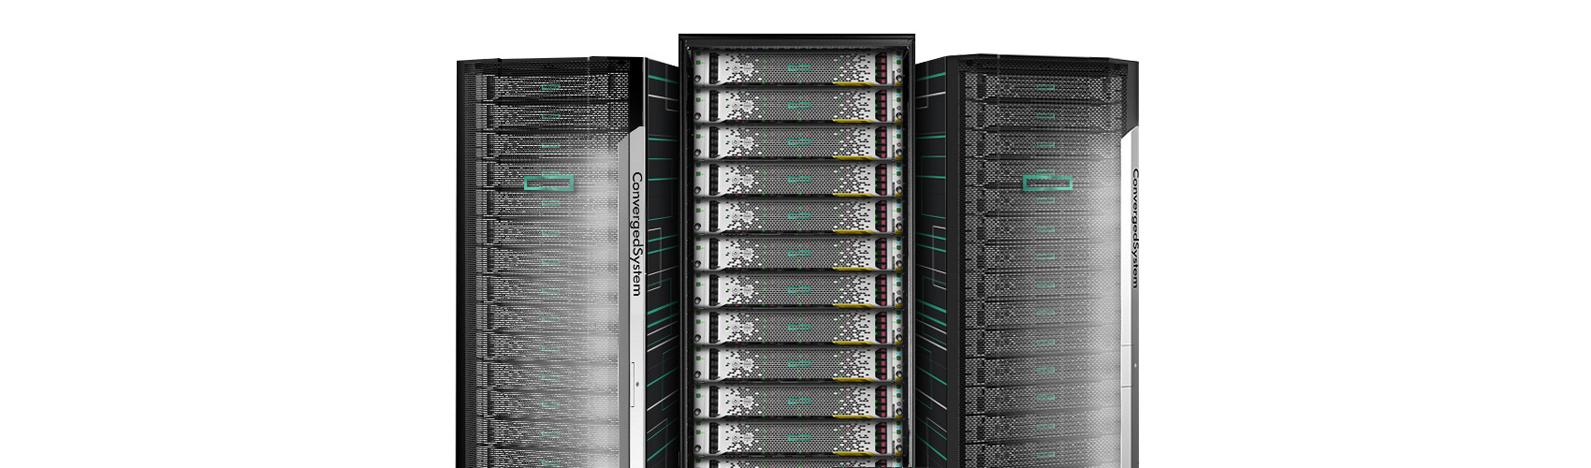 HPE ConvergedSystem para la nube